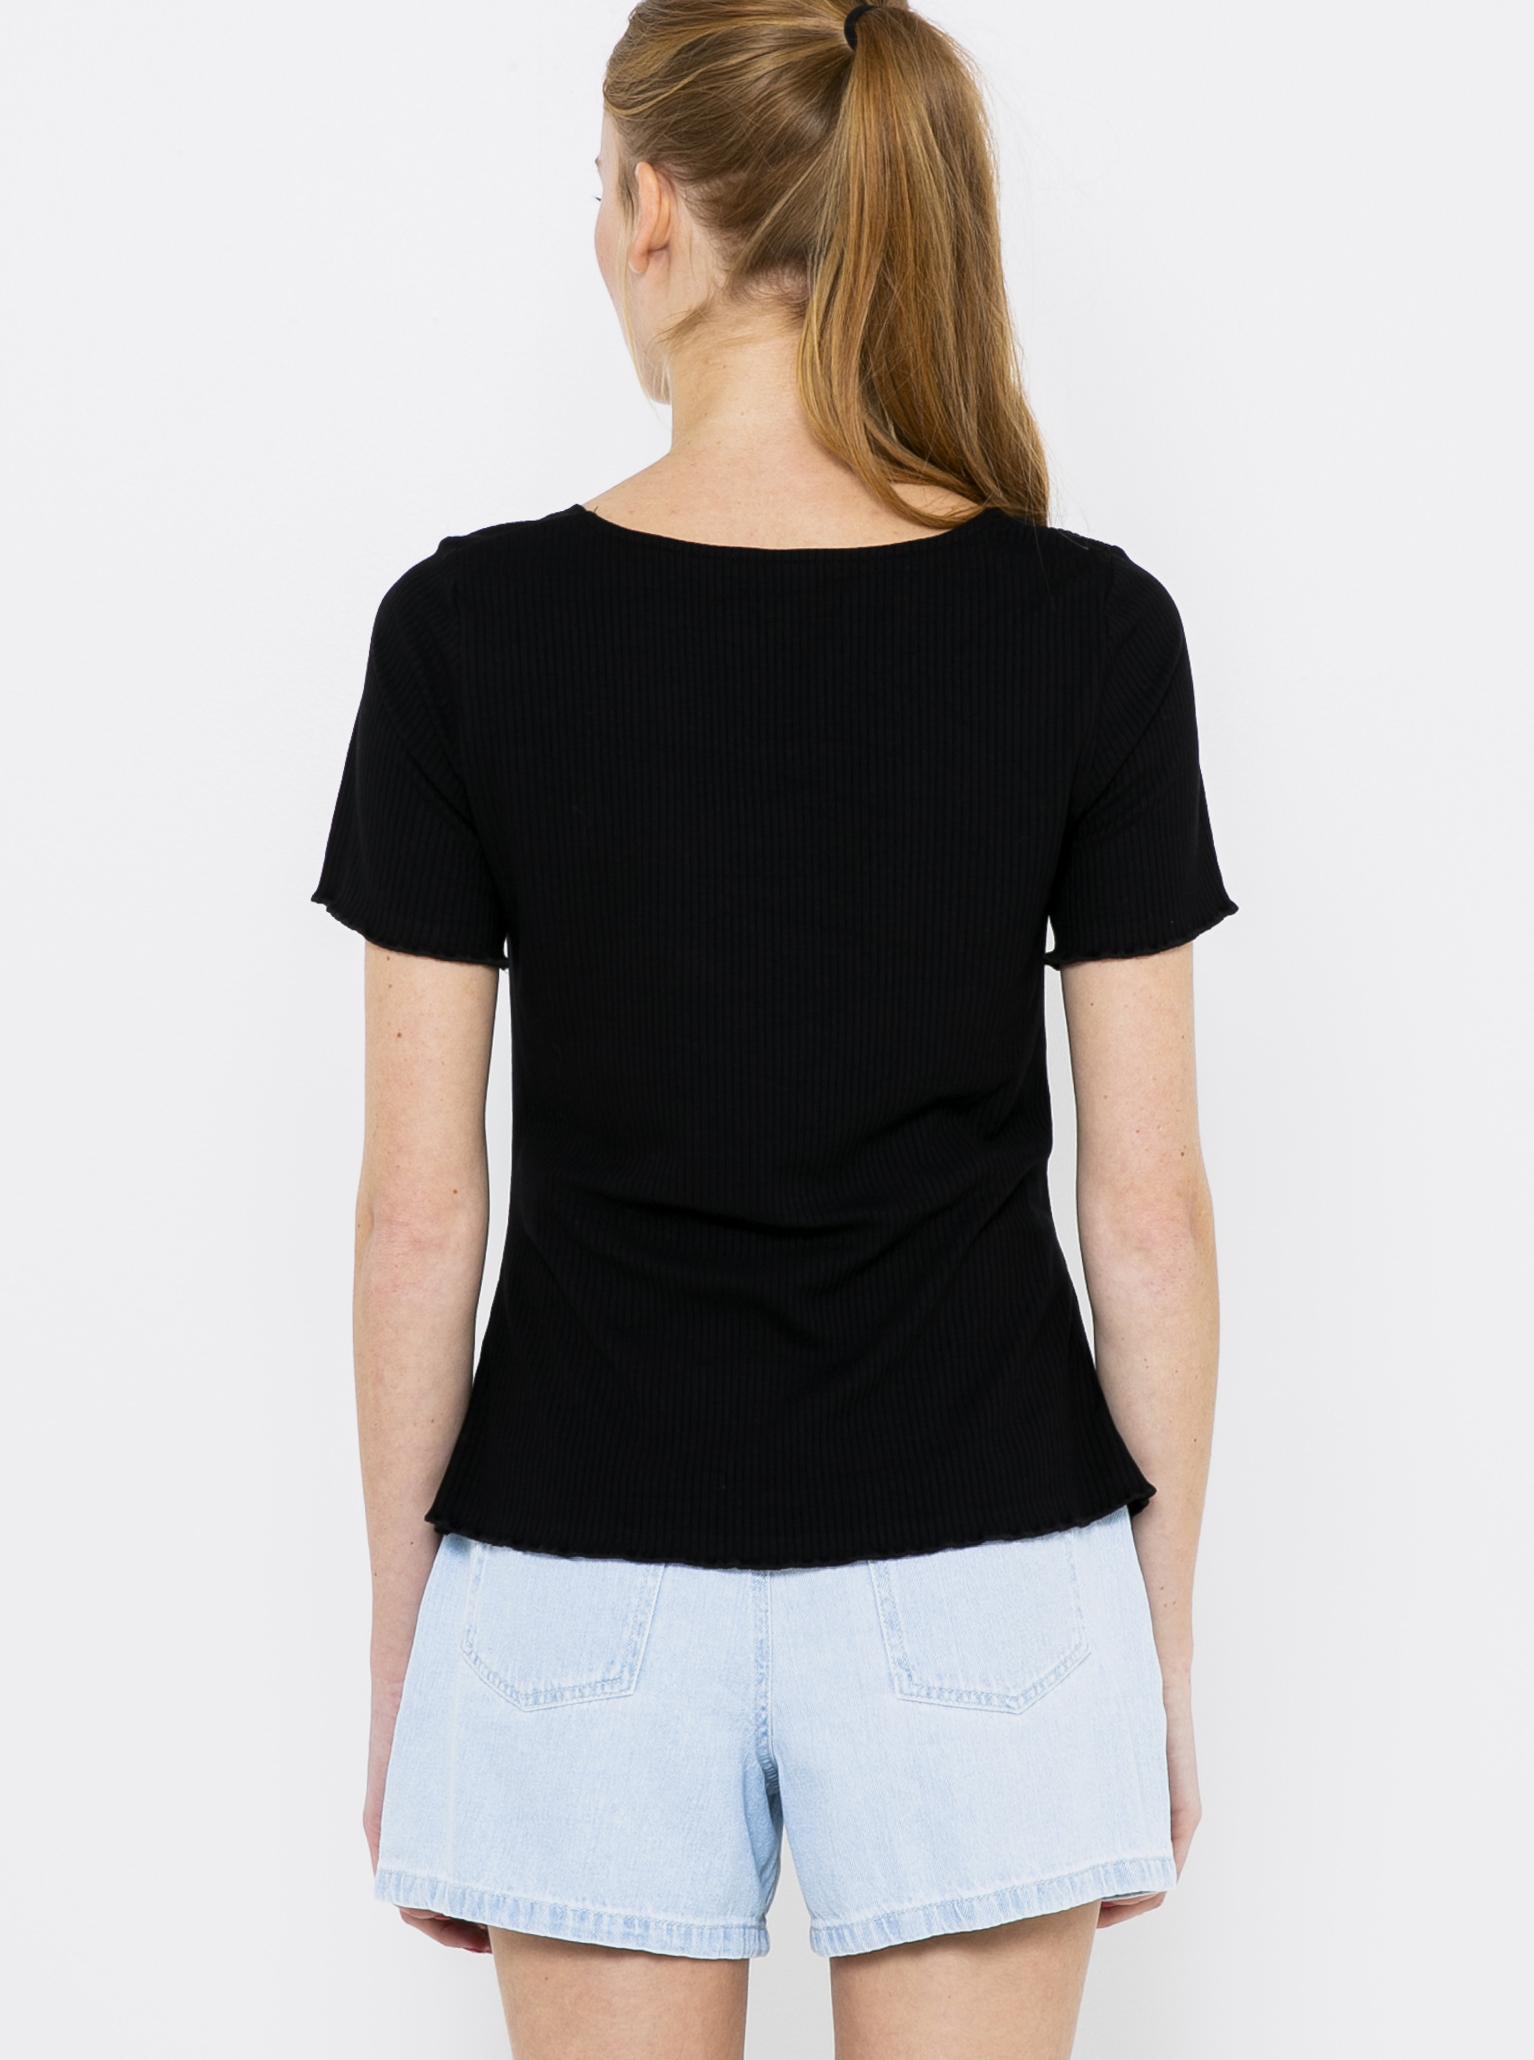 CAMAIEU Maglietta donna nero